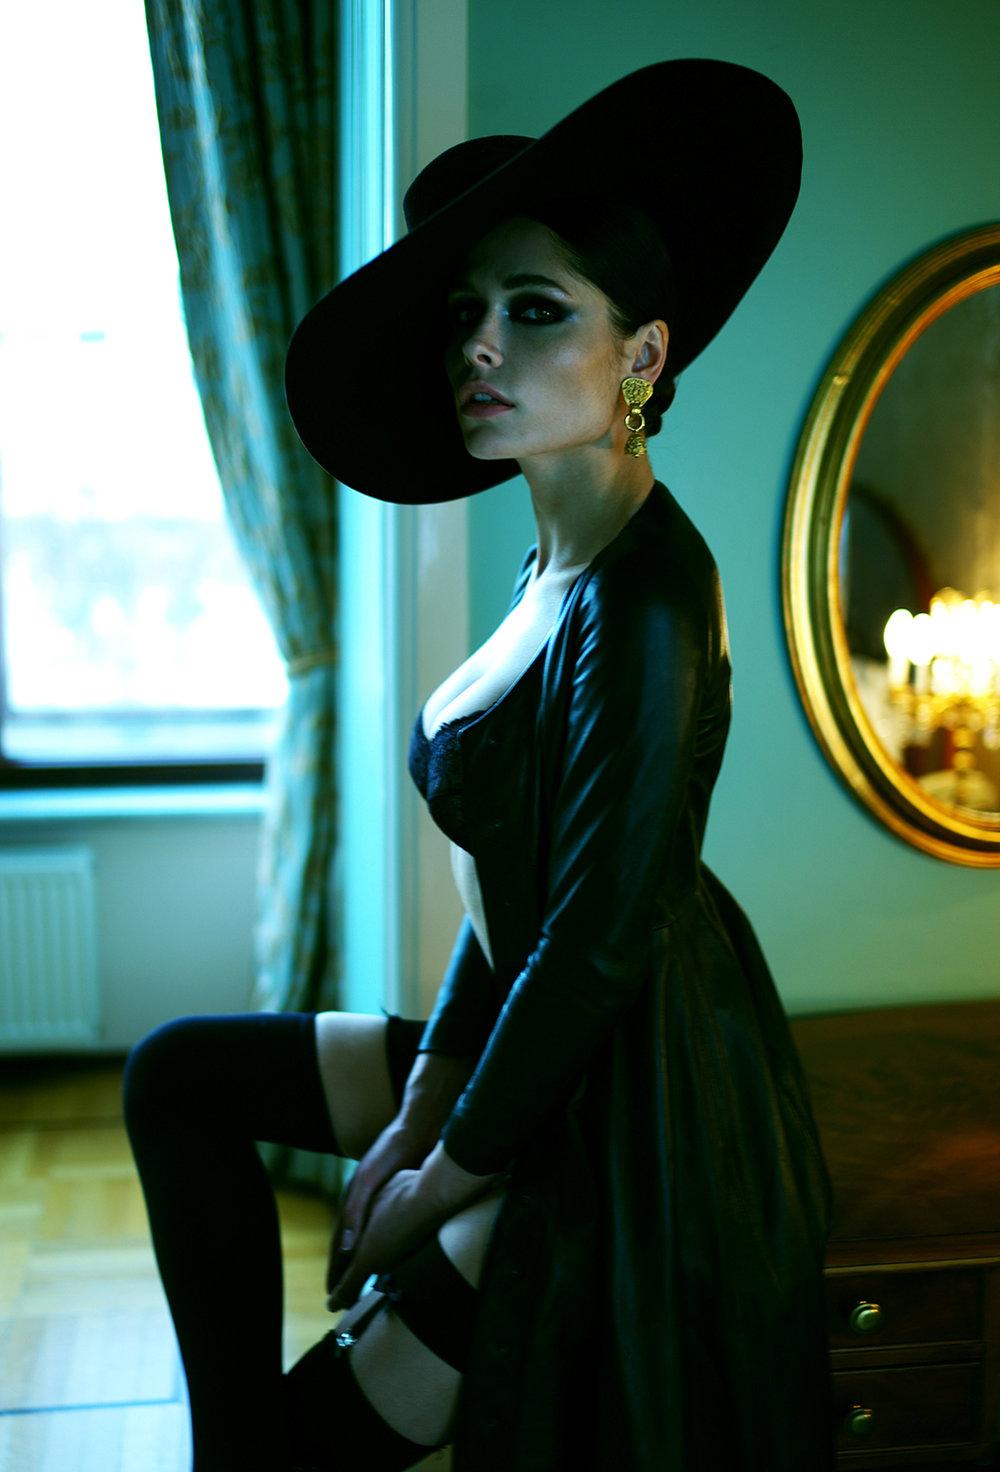 Alter-View_Photographer_Timofey_Kolesnikov_17.jpg